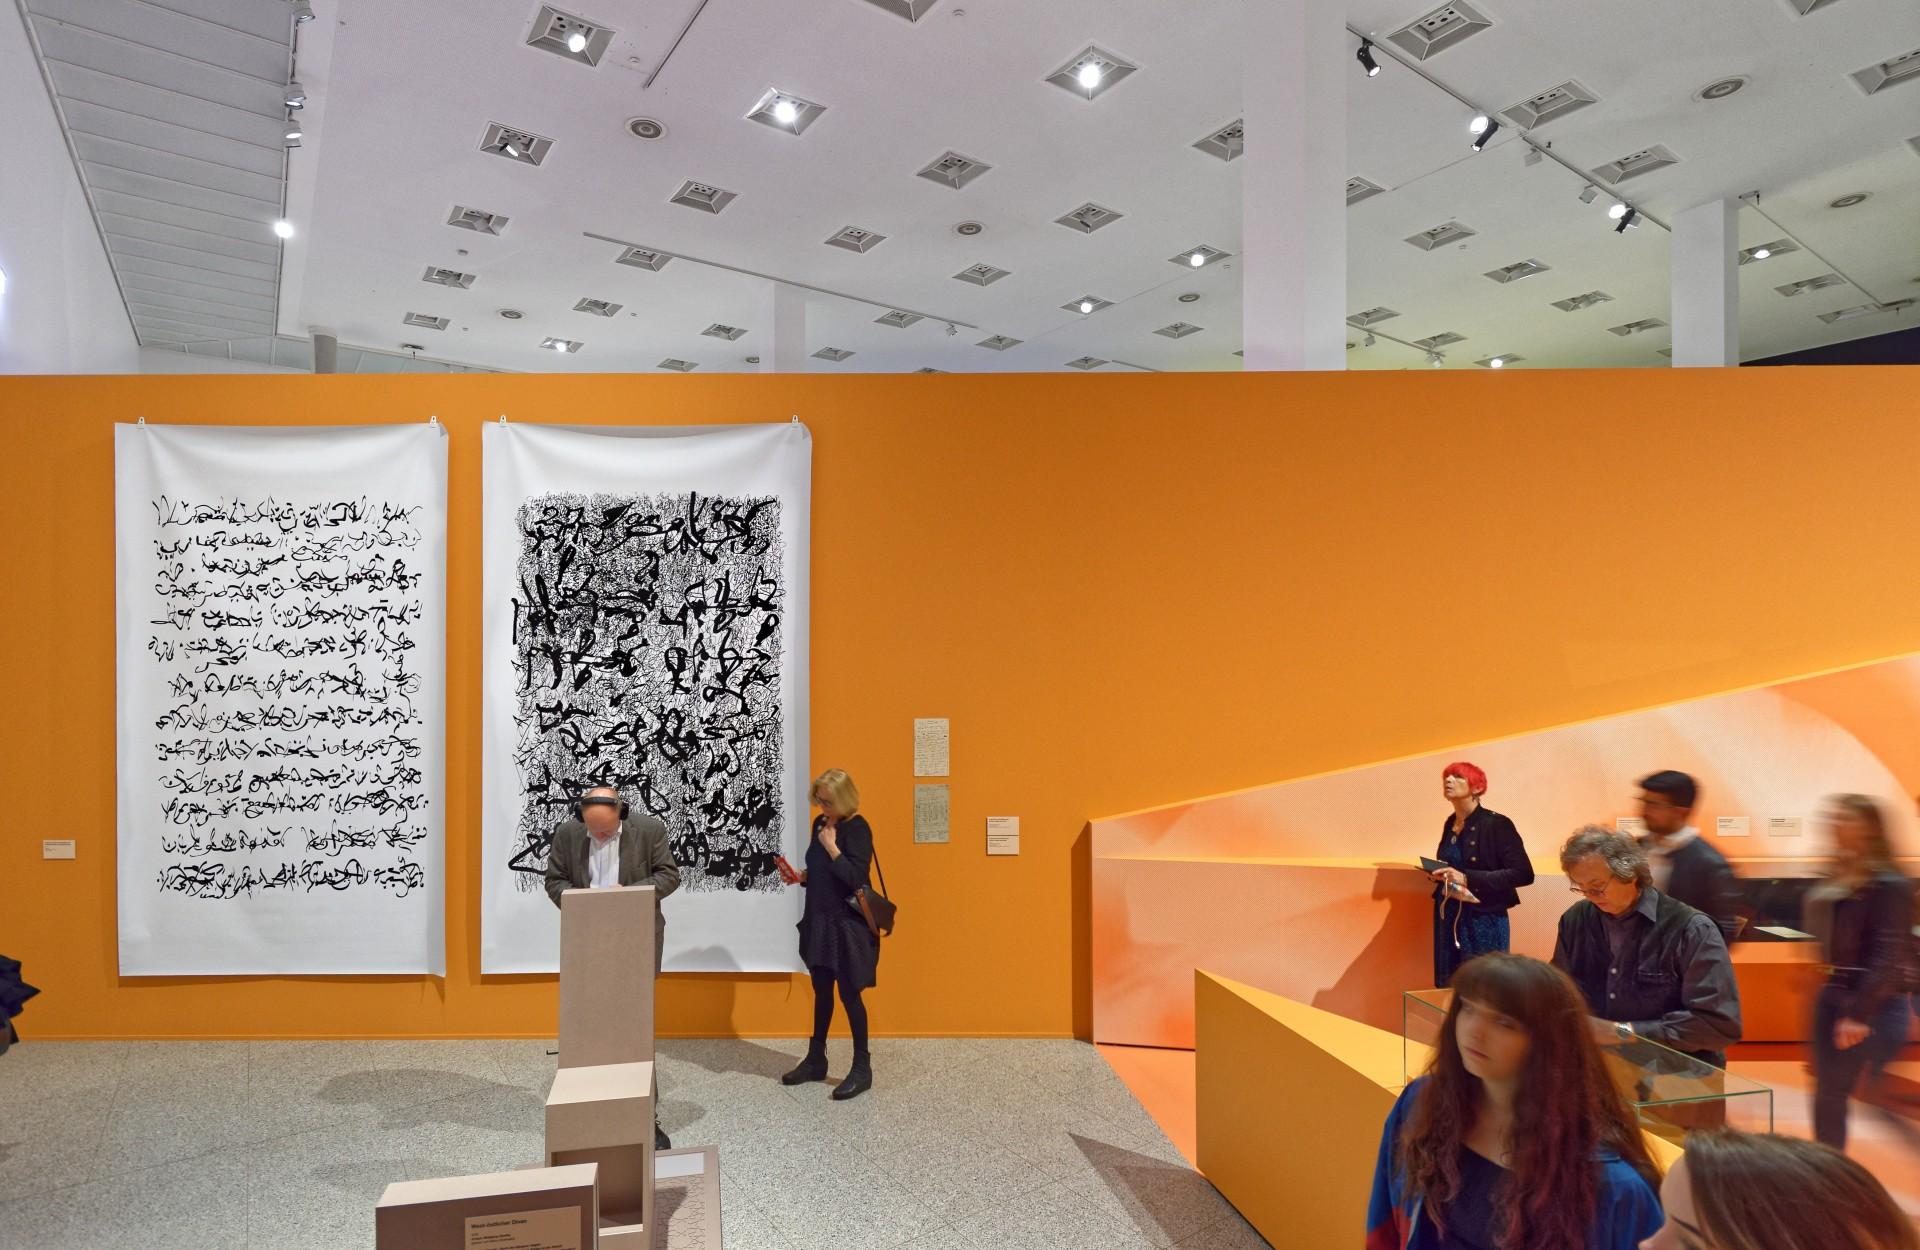 Palimpsest 004 und Palimpsest 012, je 330 x 200 cm, Latexdruck auf LKW-Plane, 2019